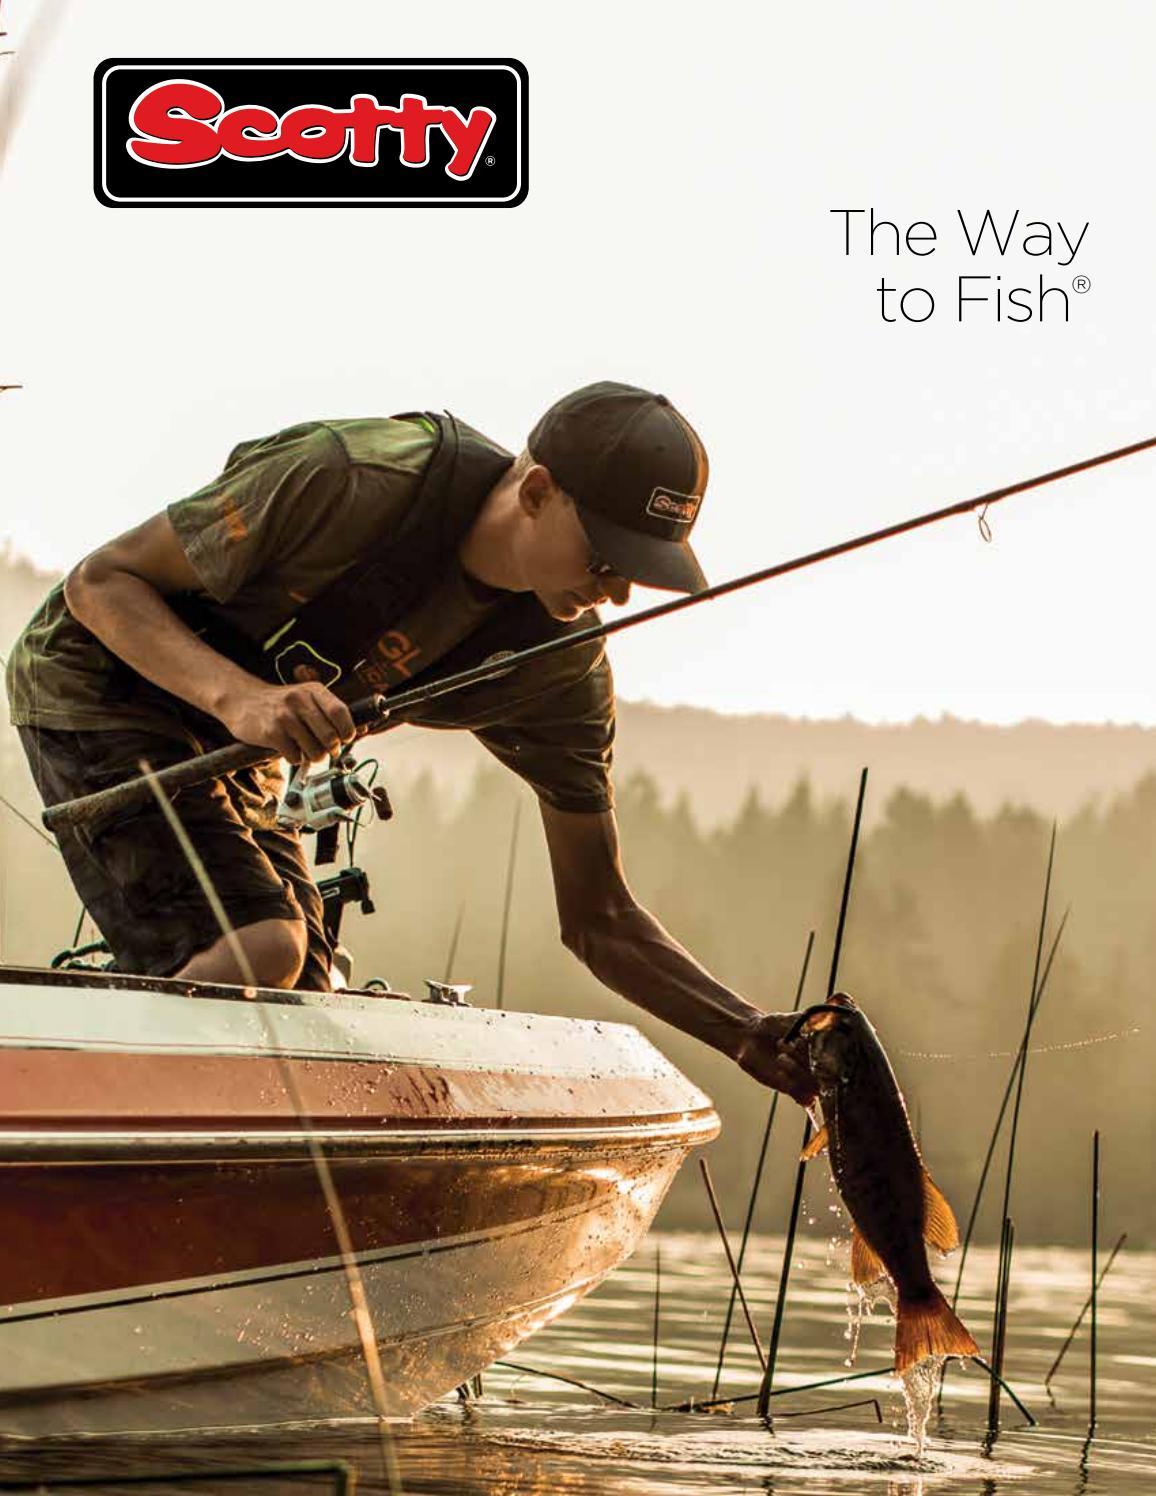 Scotty Fishing 400-Bk Orca Rod Holder W 241 Side Deck Mount